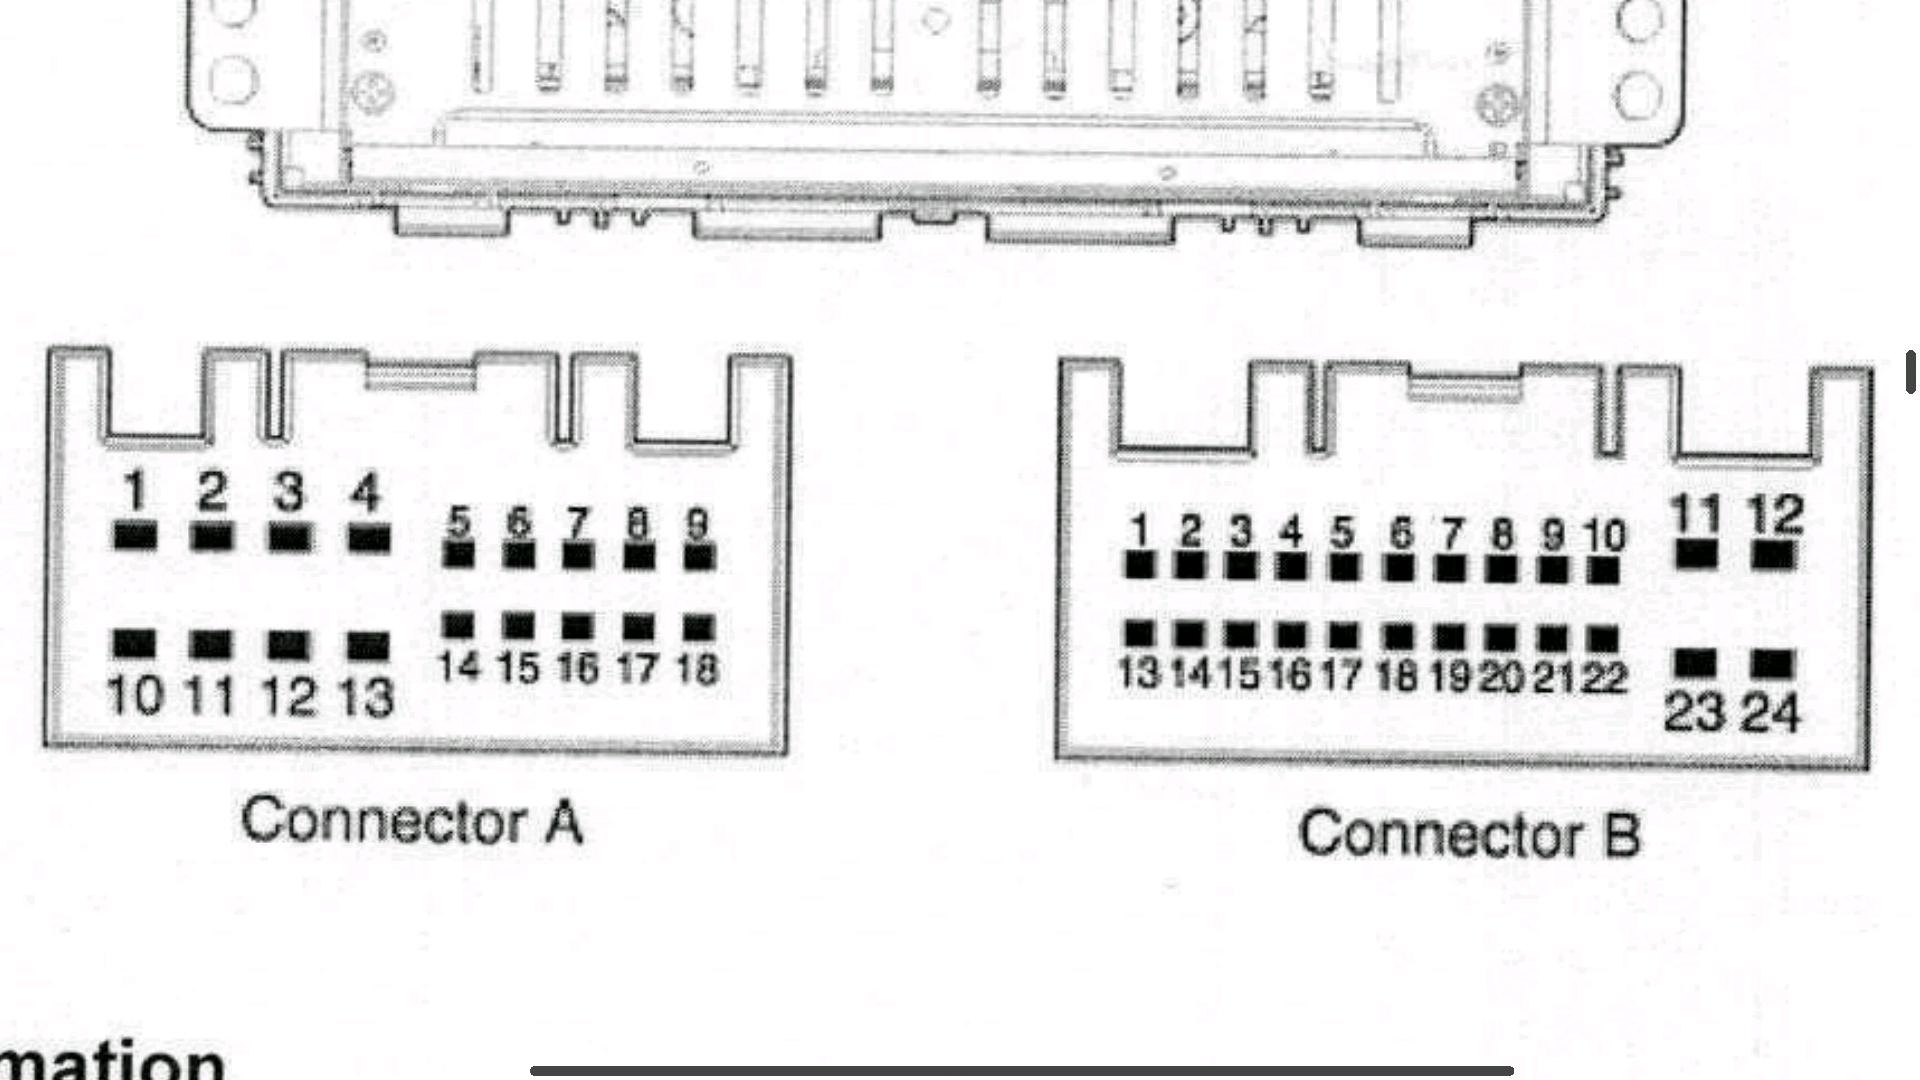 Hyundai Tucson radio 96170D70104X Wiring and connector diagram | Hyundai  Forums | Tucson Radio Wiring Diagram 2007 |  | Hyundai Forums